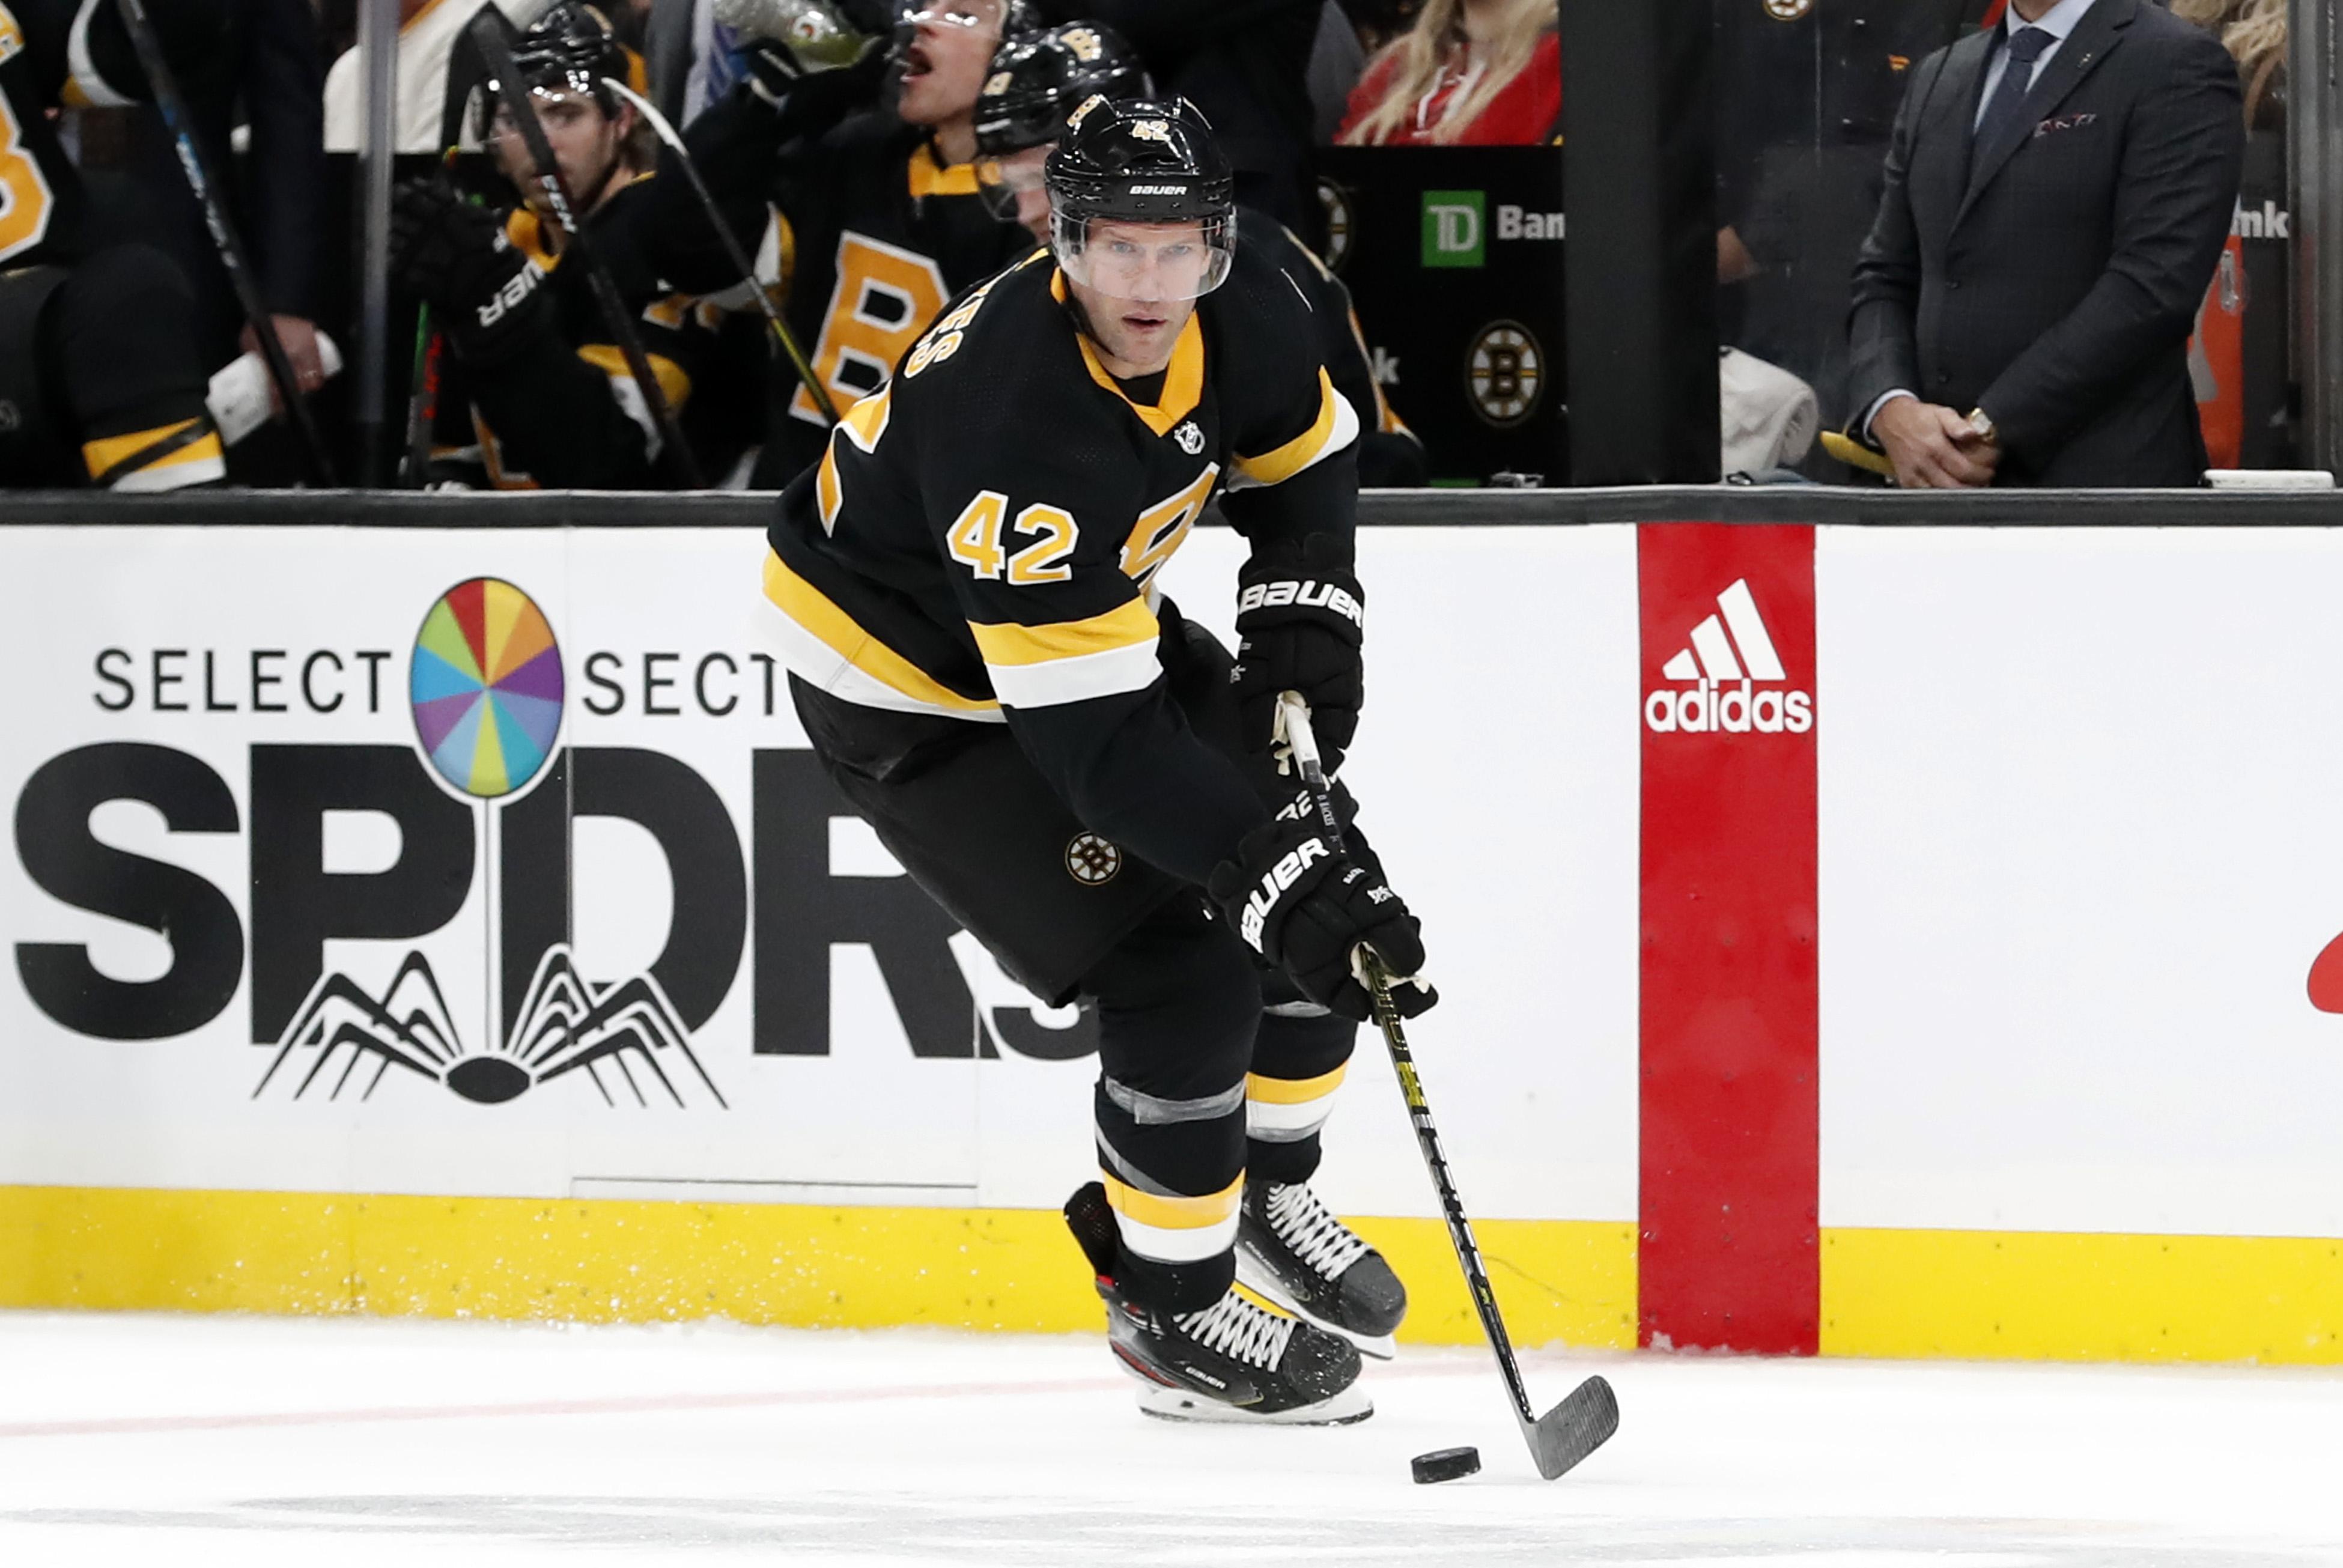 NHL: DEC 01 Canadiens at Bruins